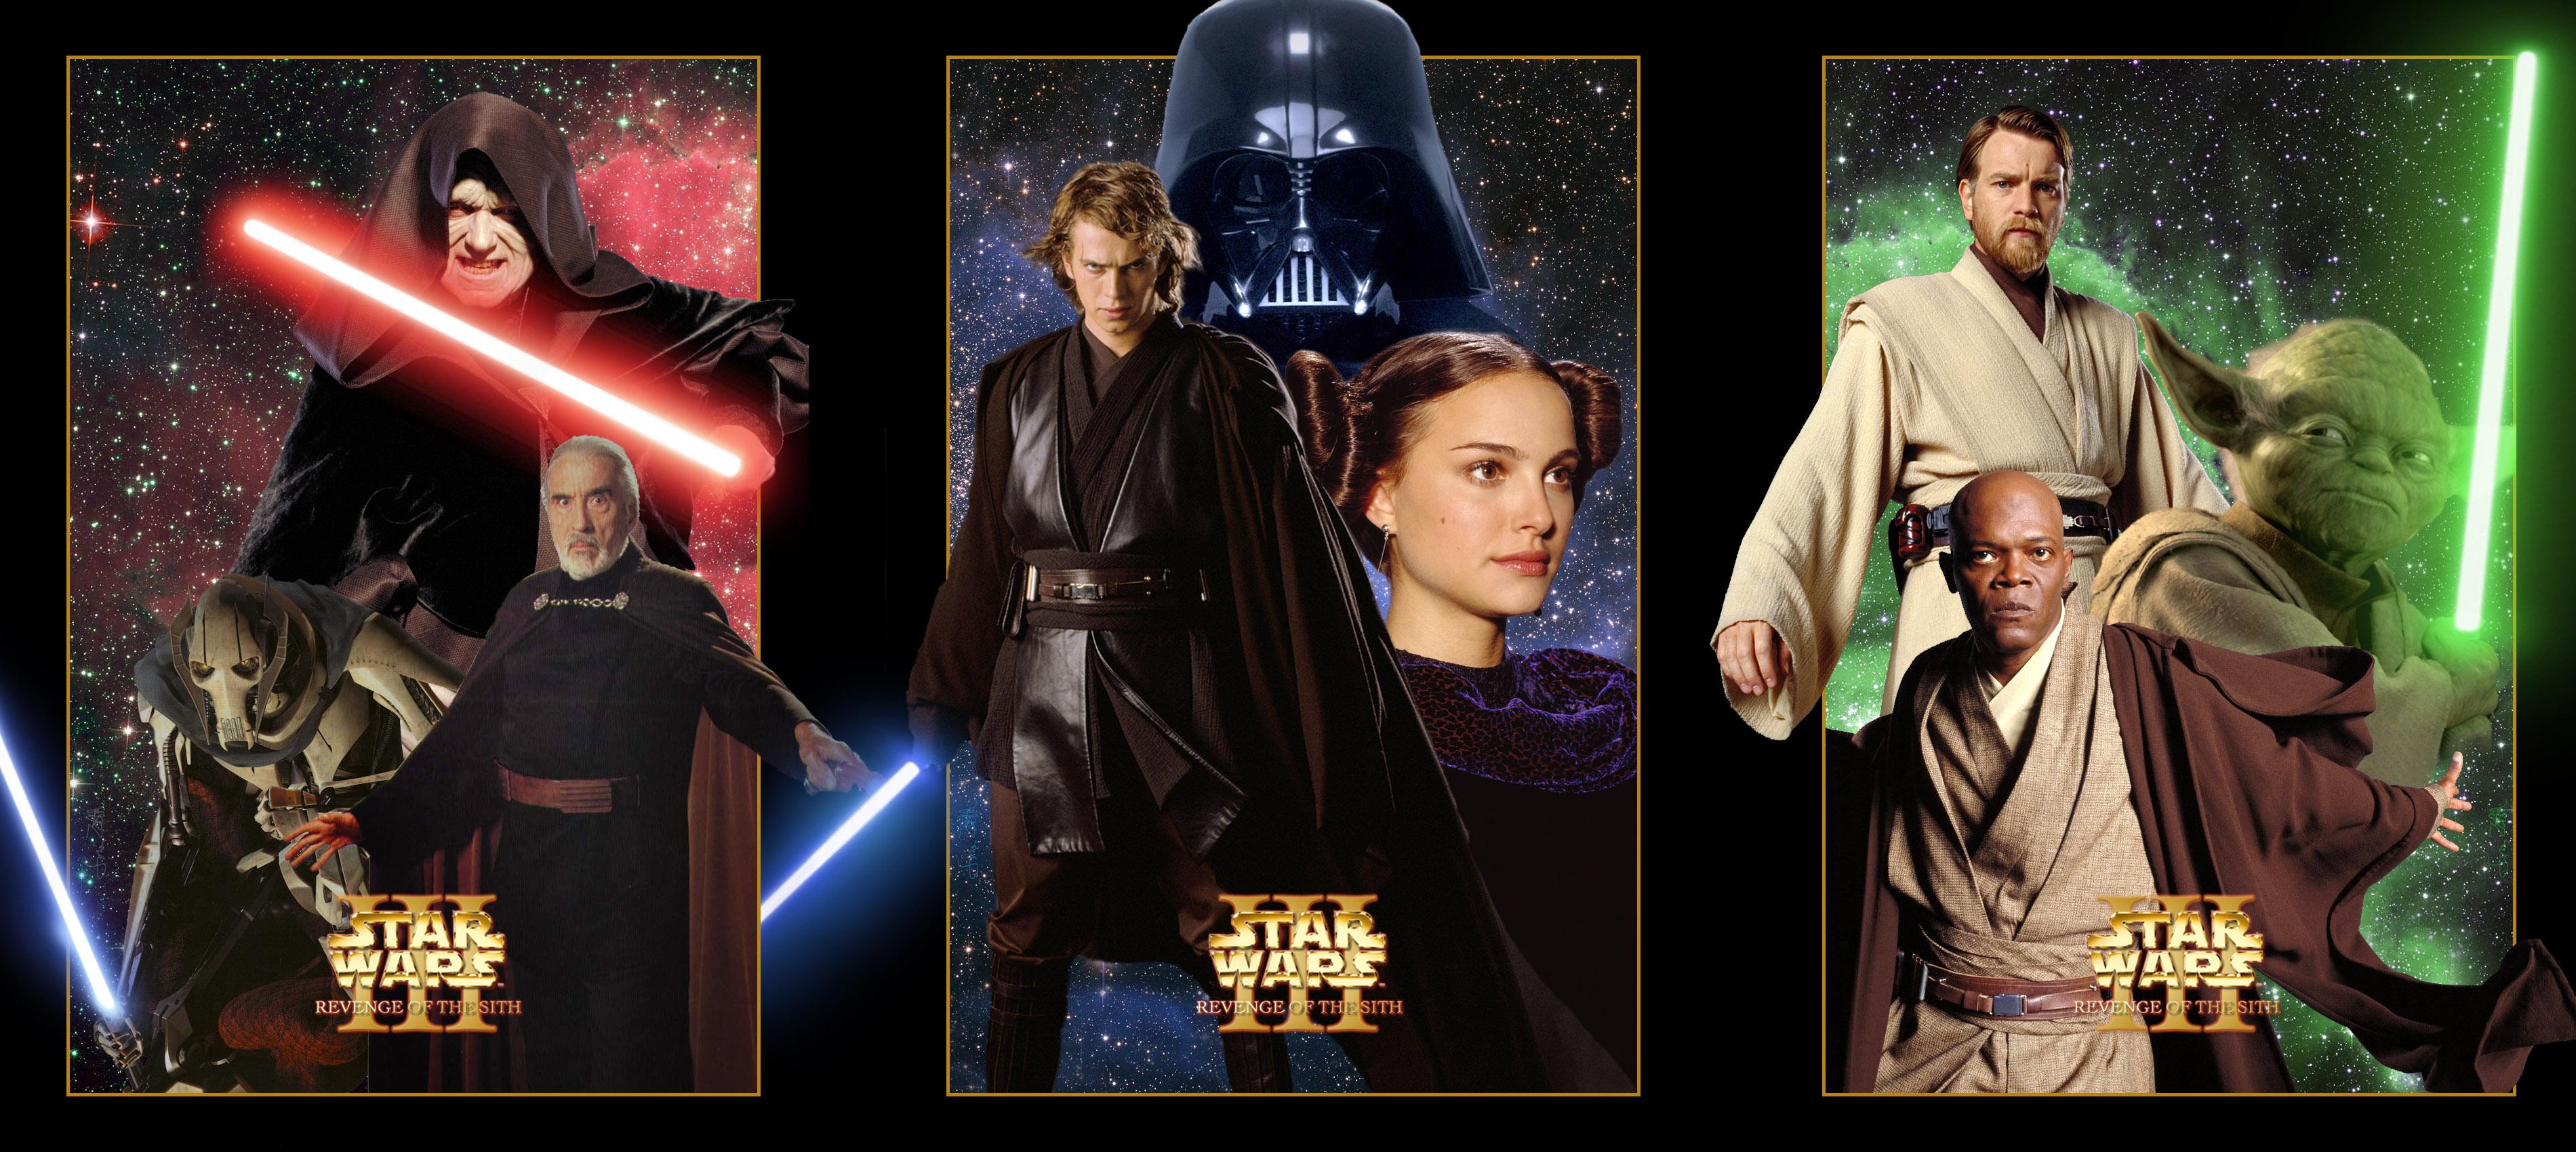 Star Wars Lightsabers Darth Vader Sith Luke Skywalker Padme